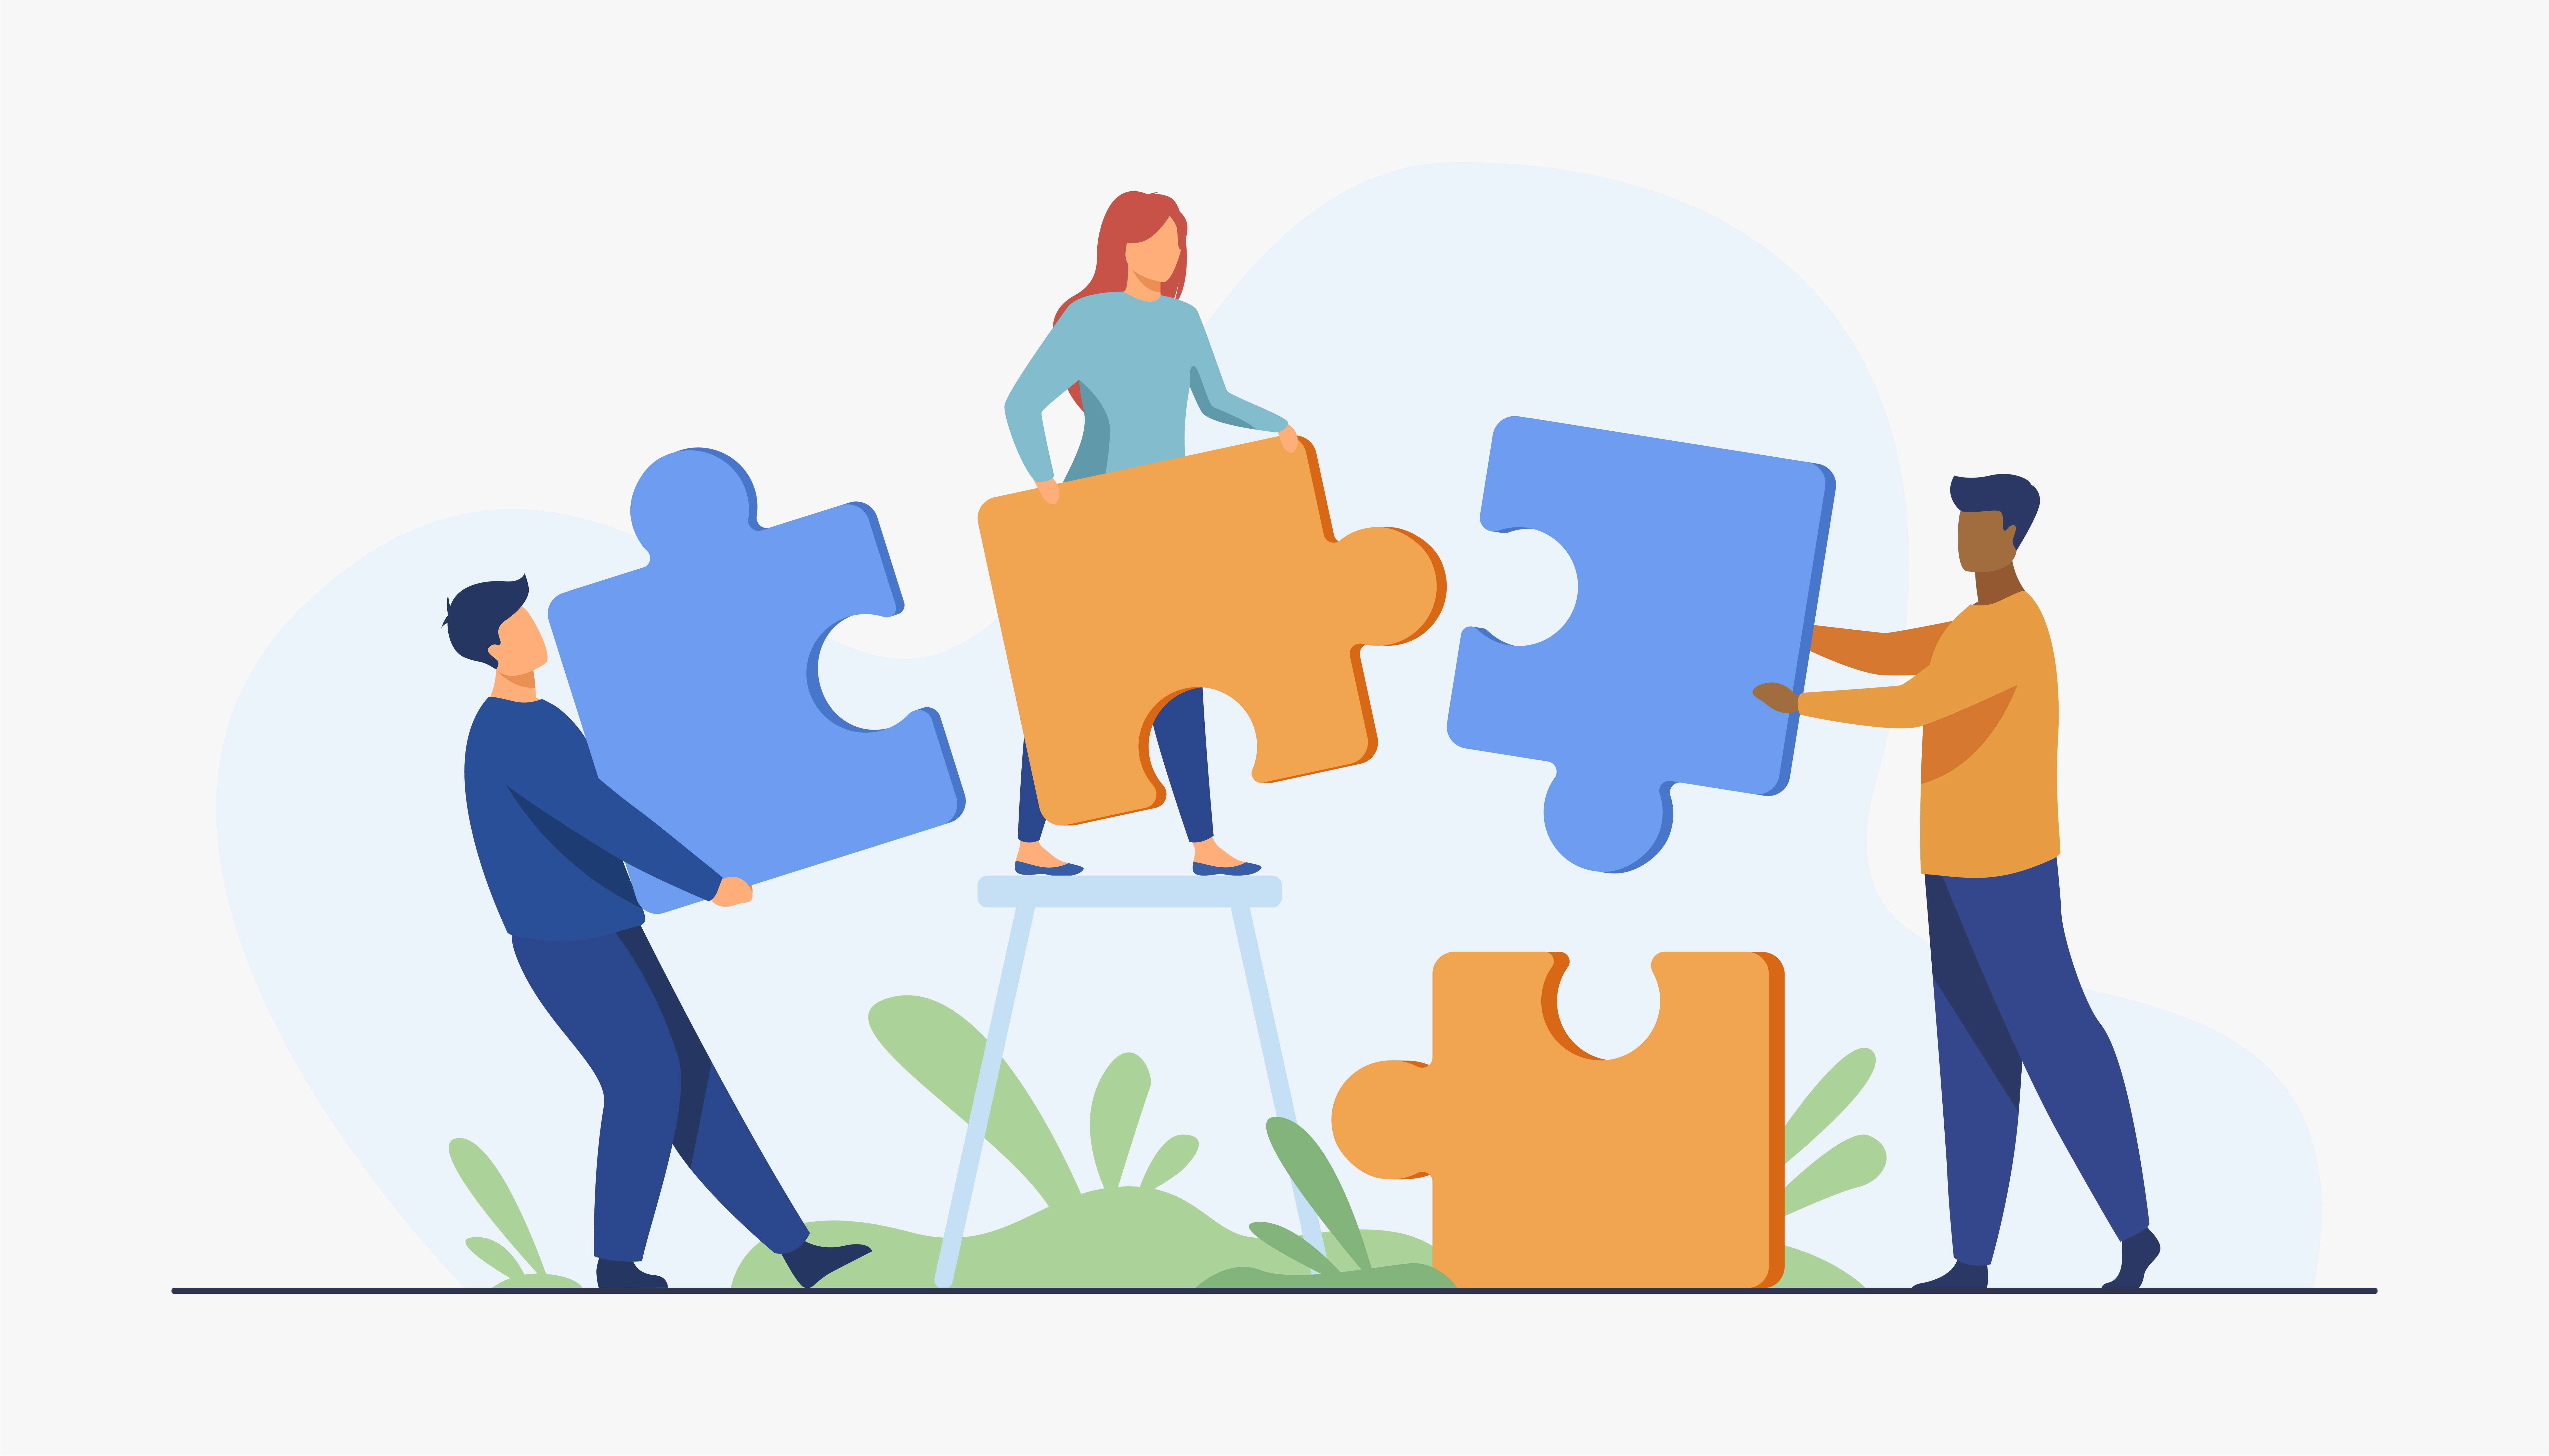 Partenaires tenant de grandes pièces de puzzle